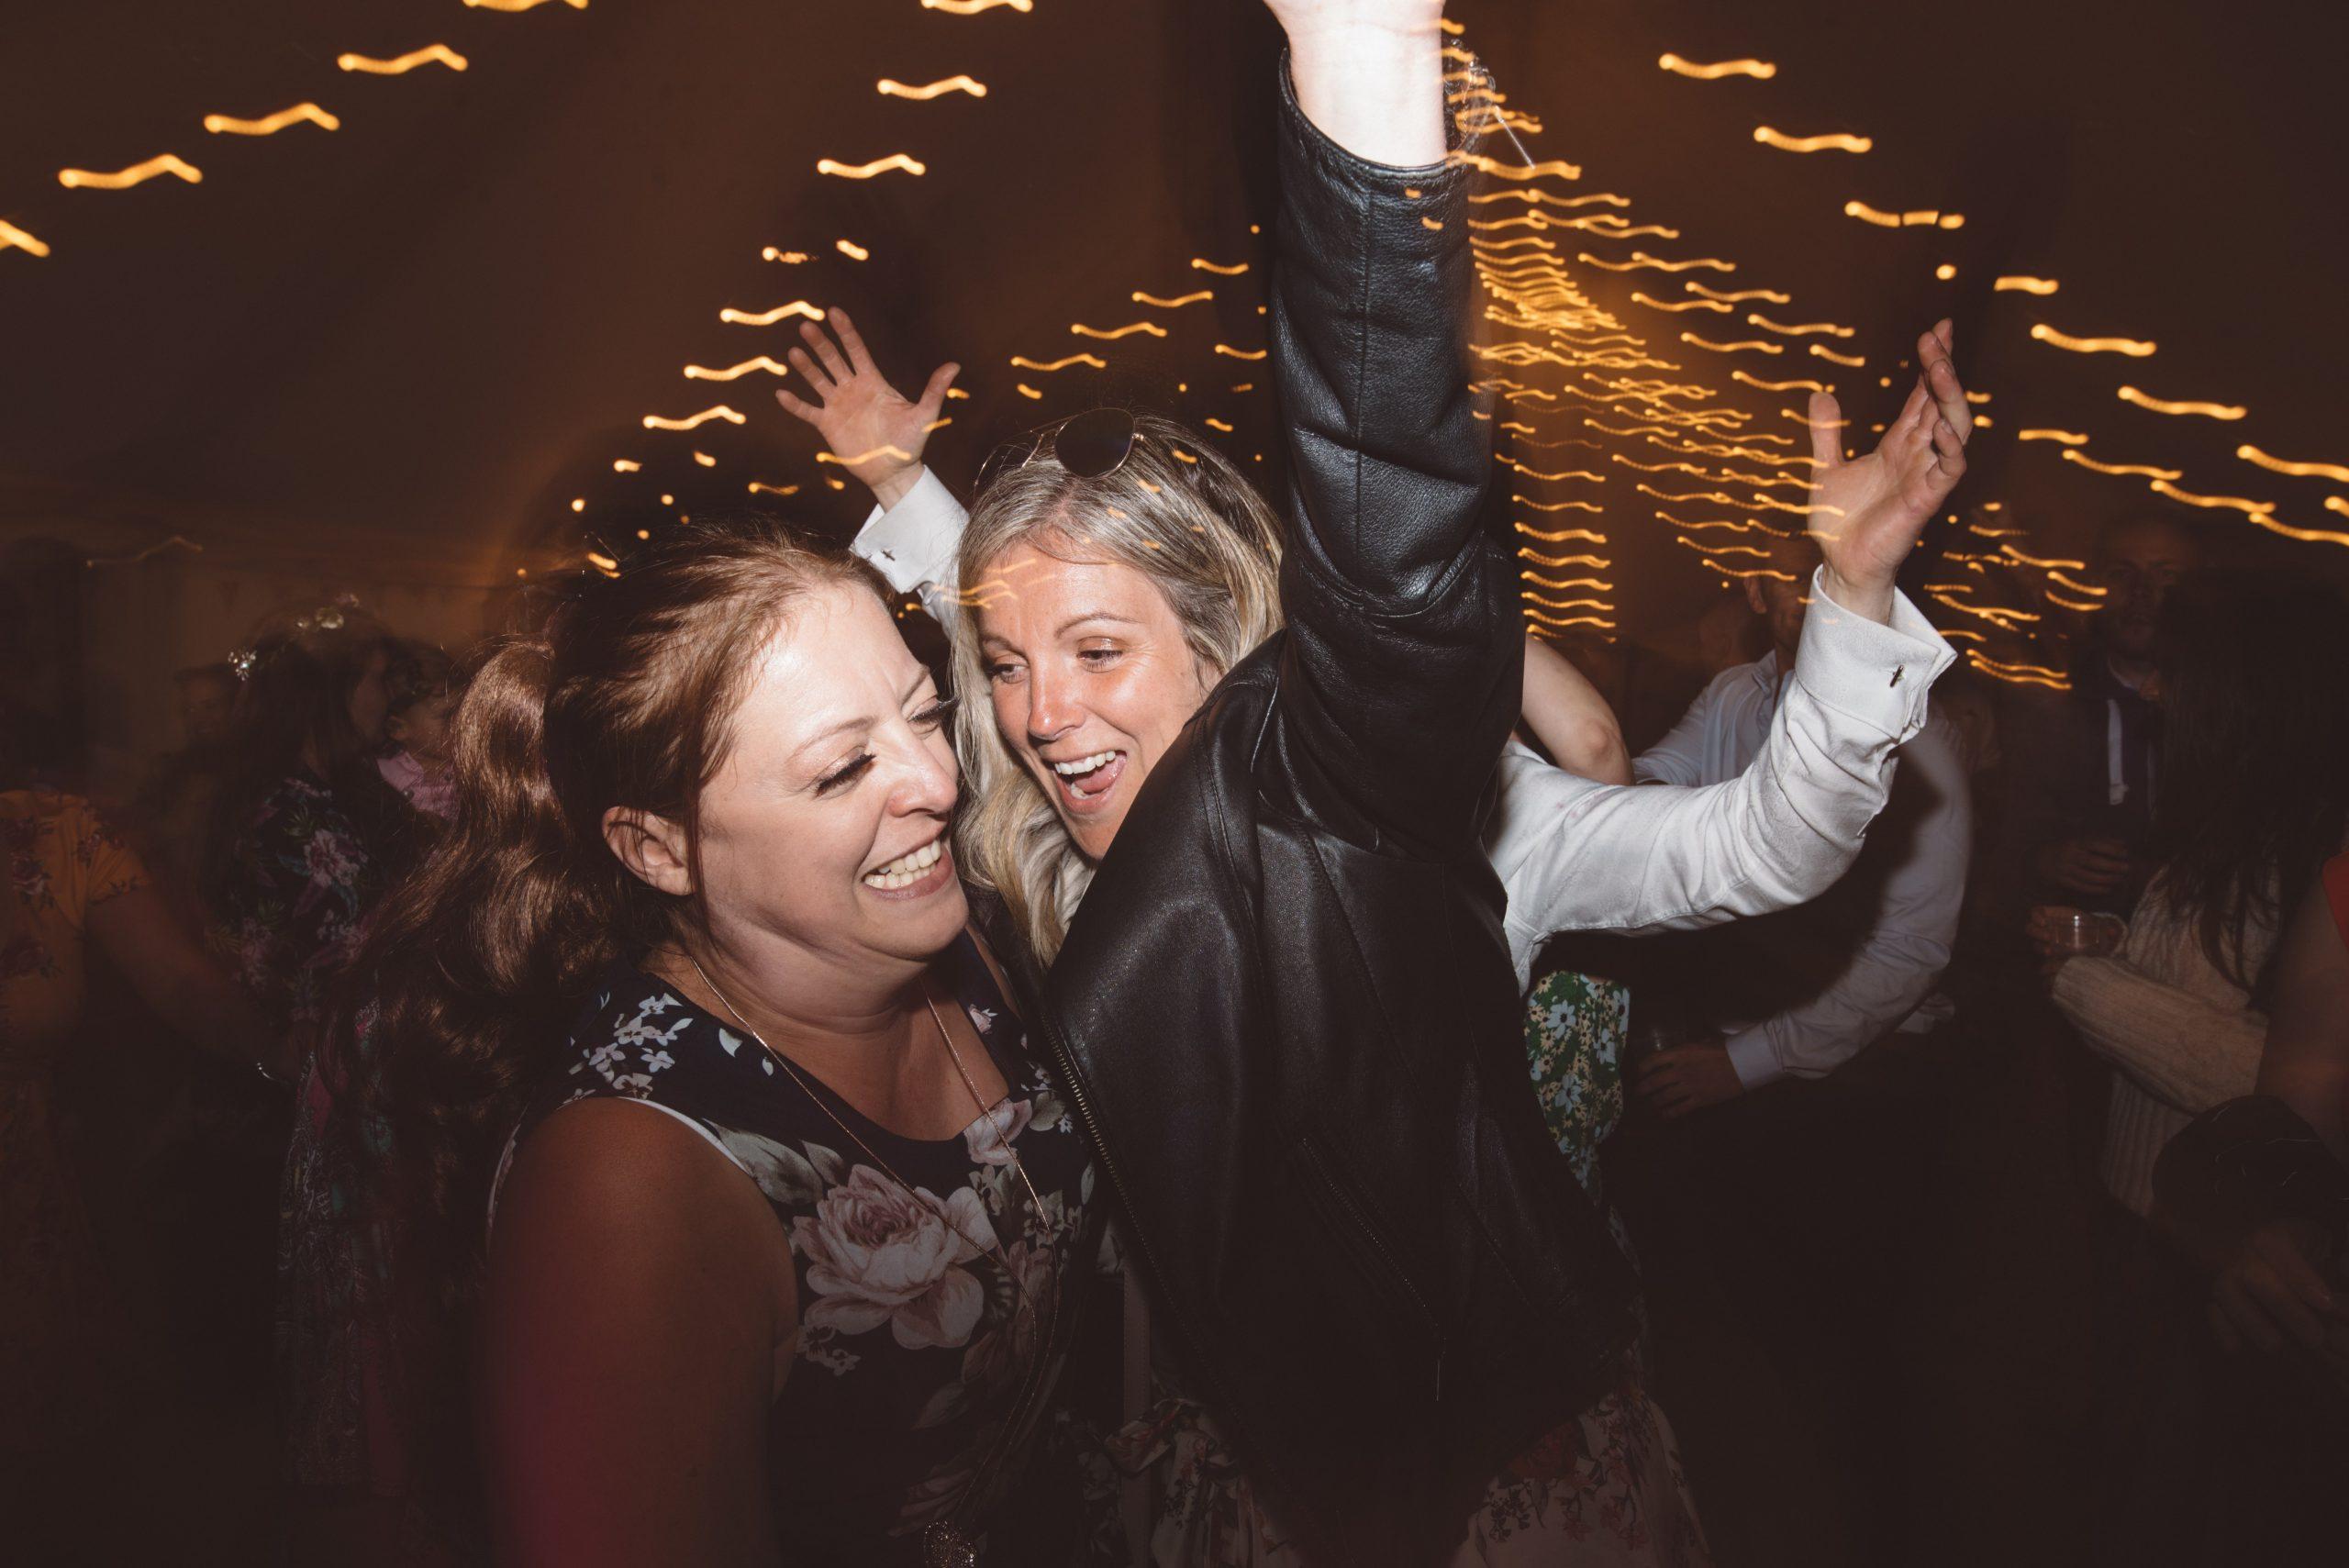 Dragging the shutter wedding photography in Devon